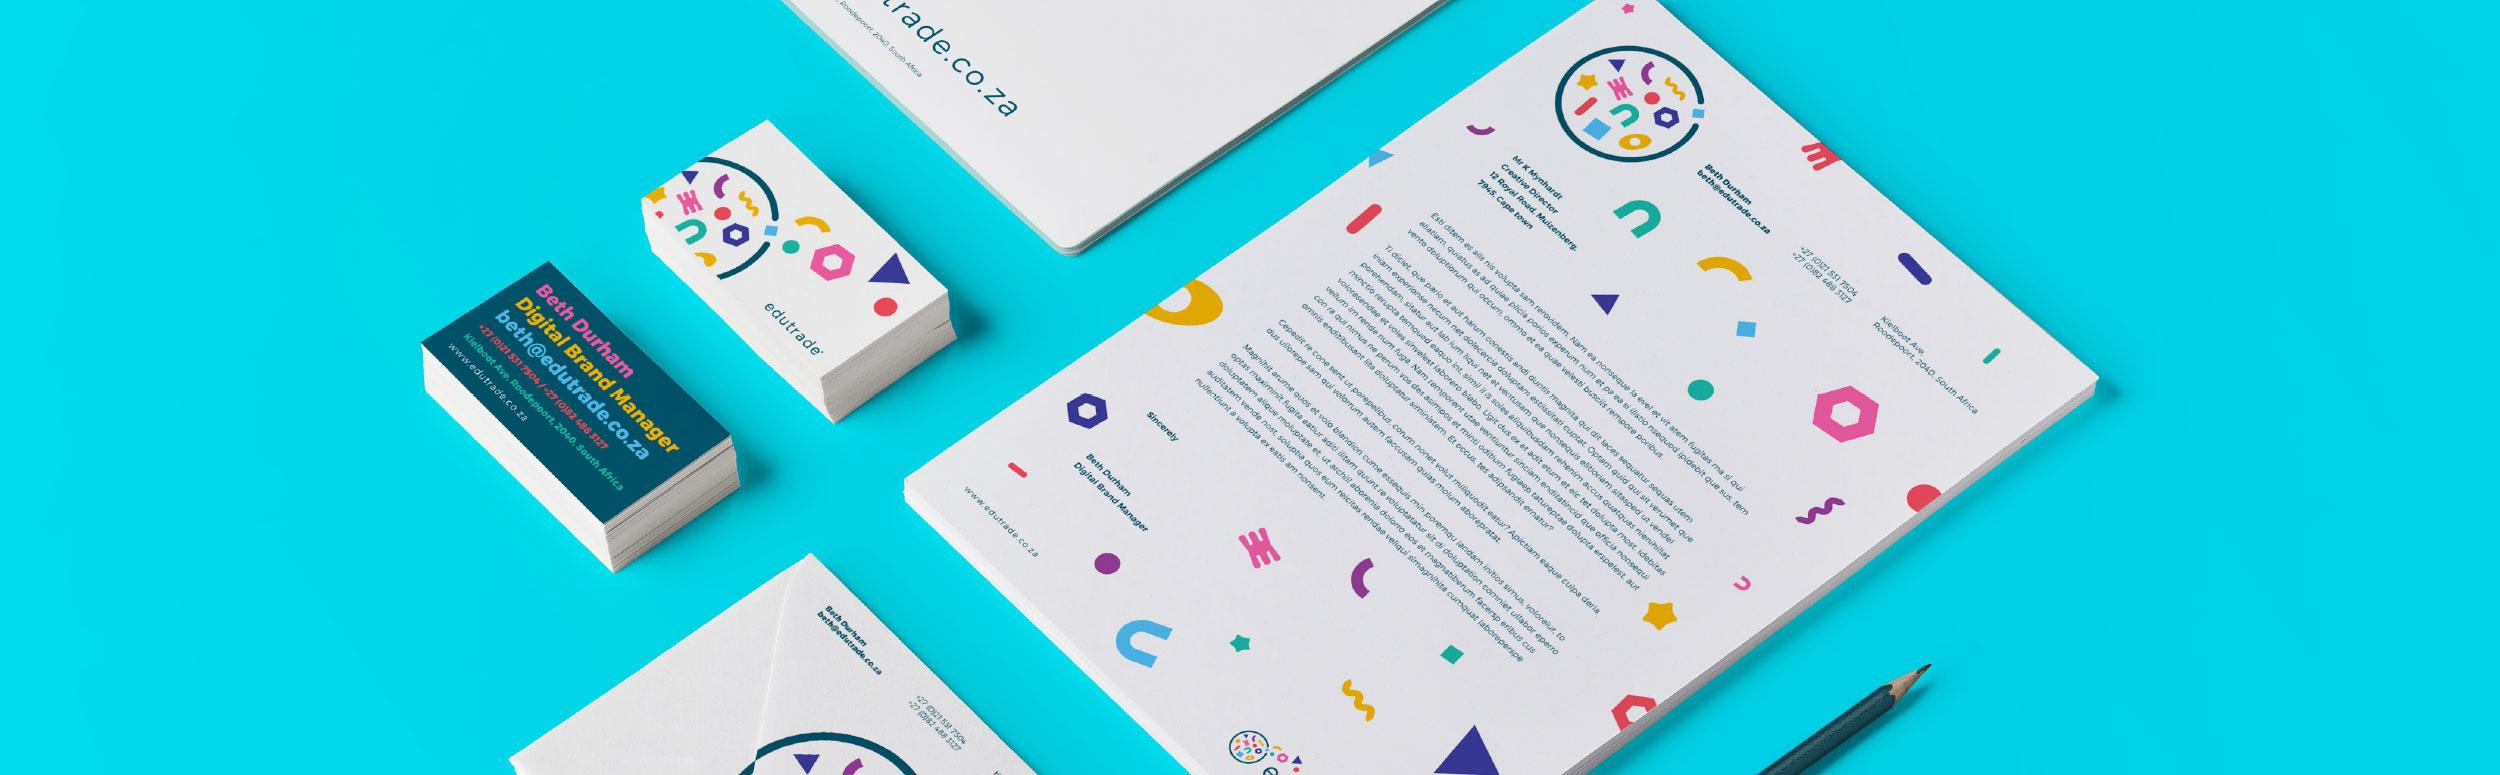 Corporate identity design elements